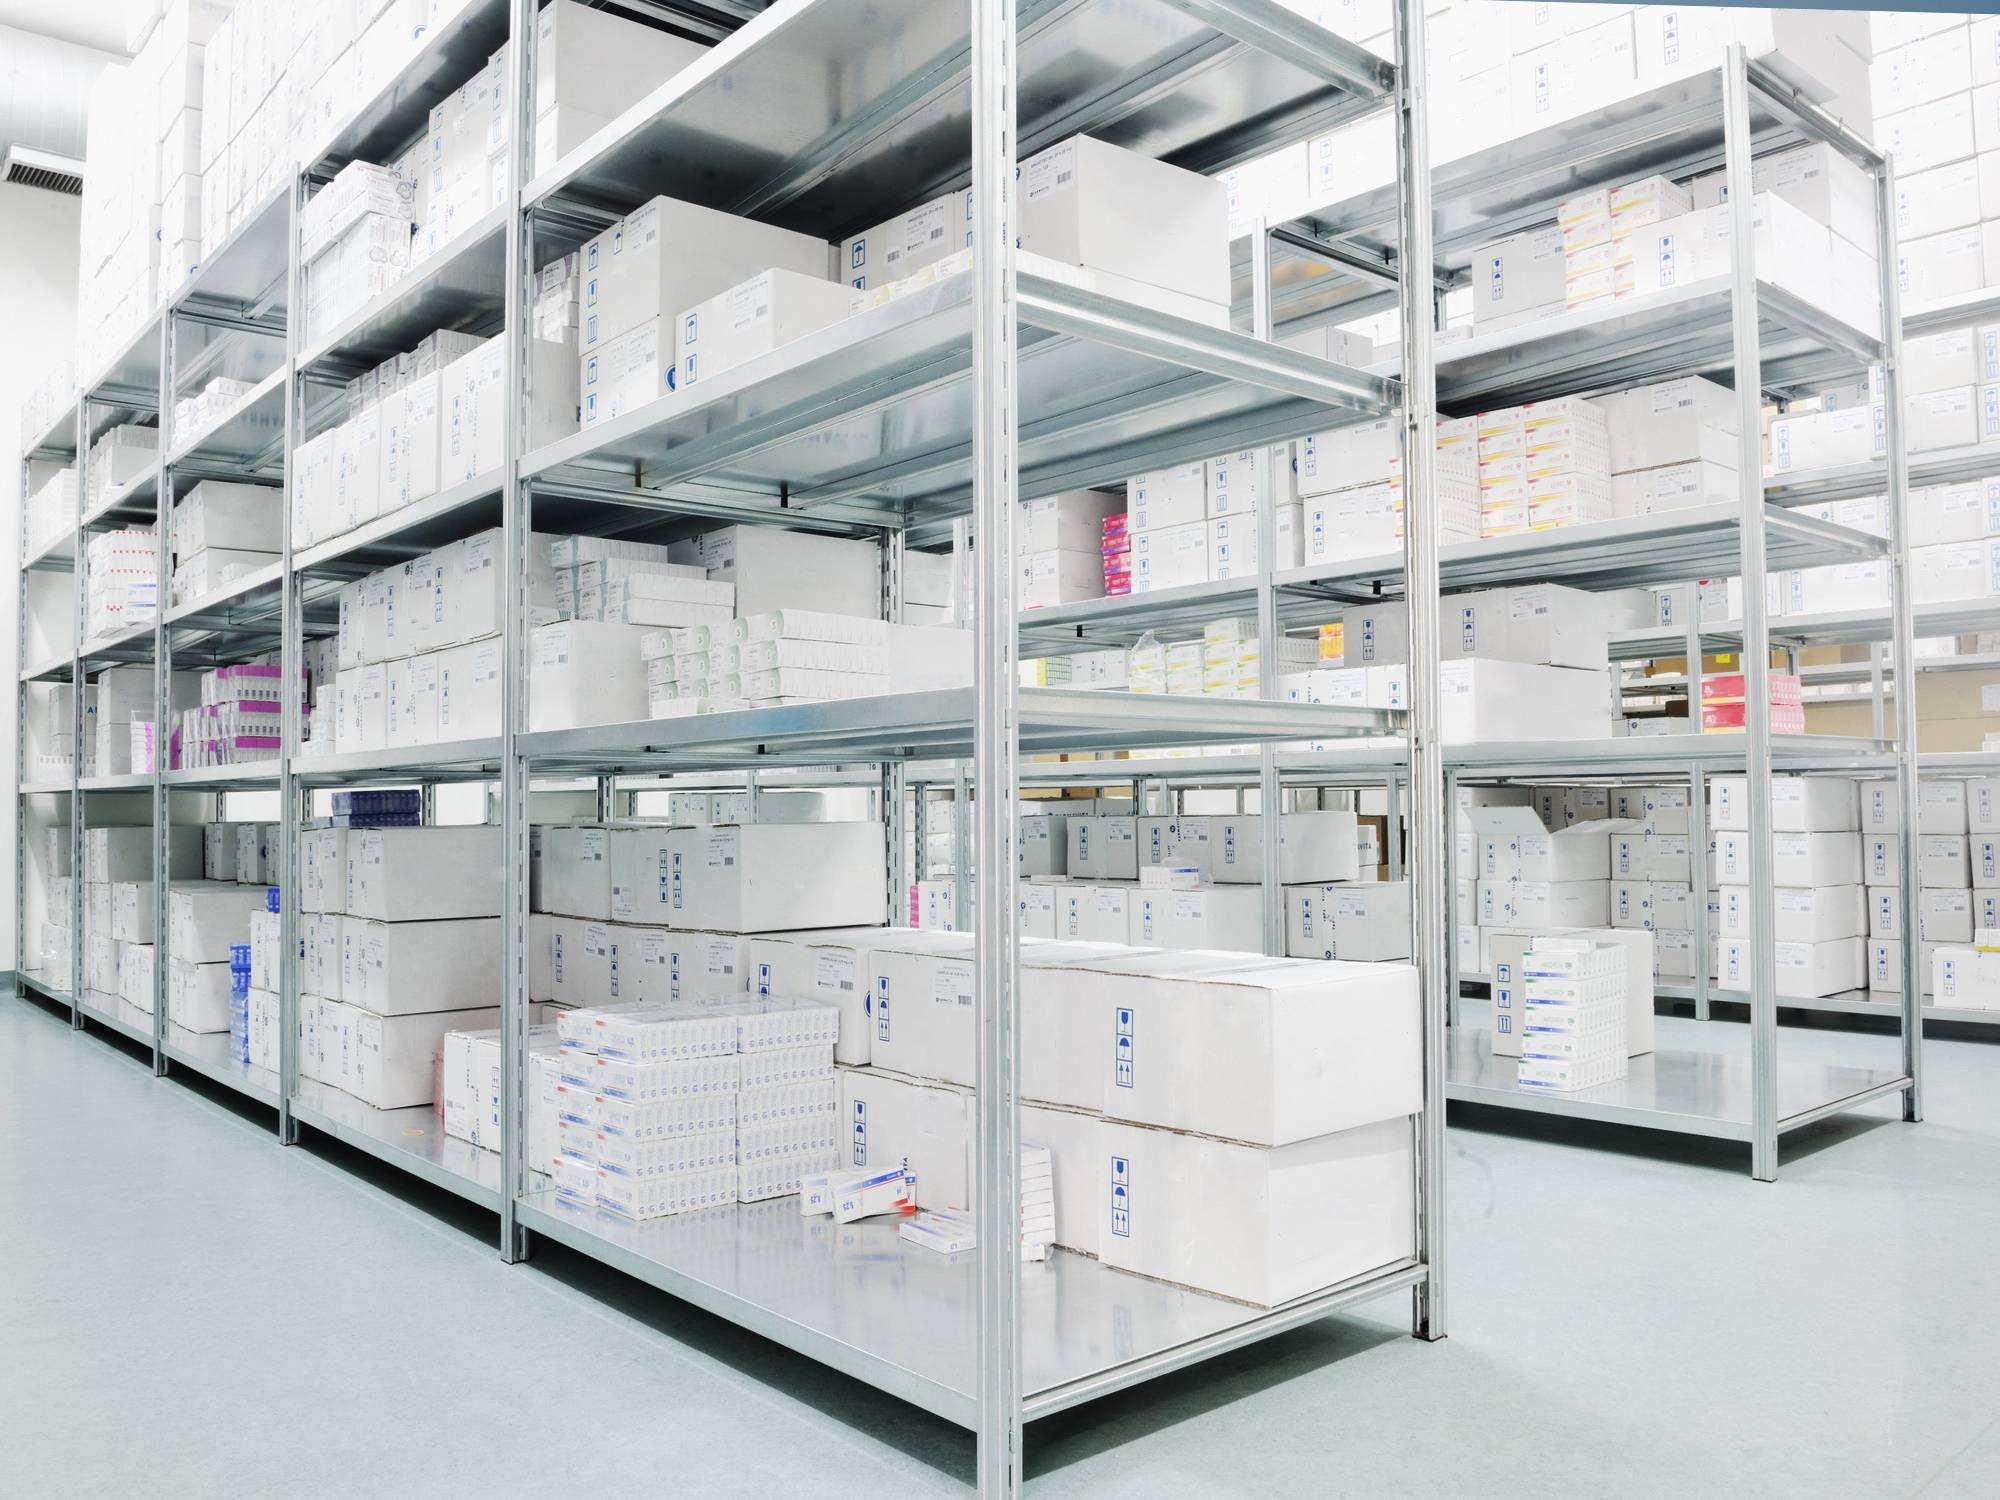 testo Saveris生命科学环境监测系统在物流仓储领域的应用